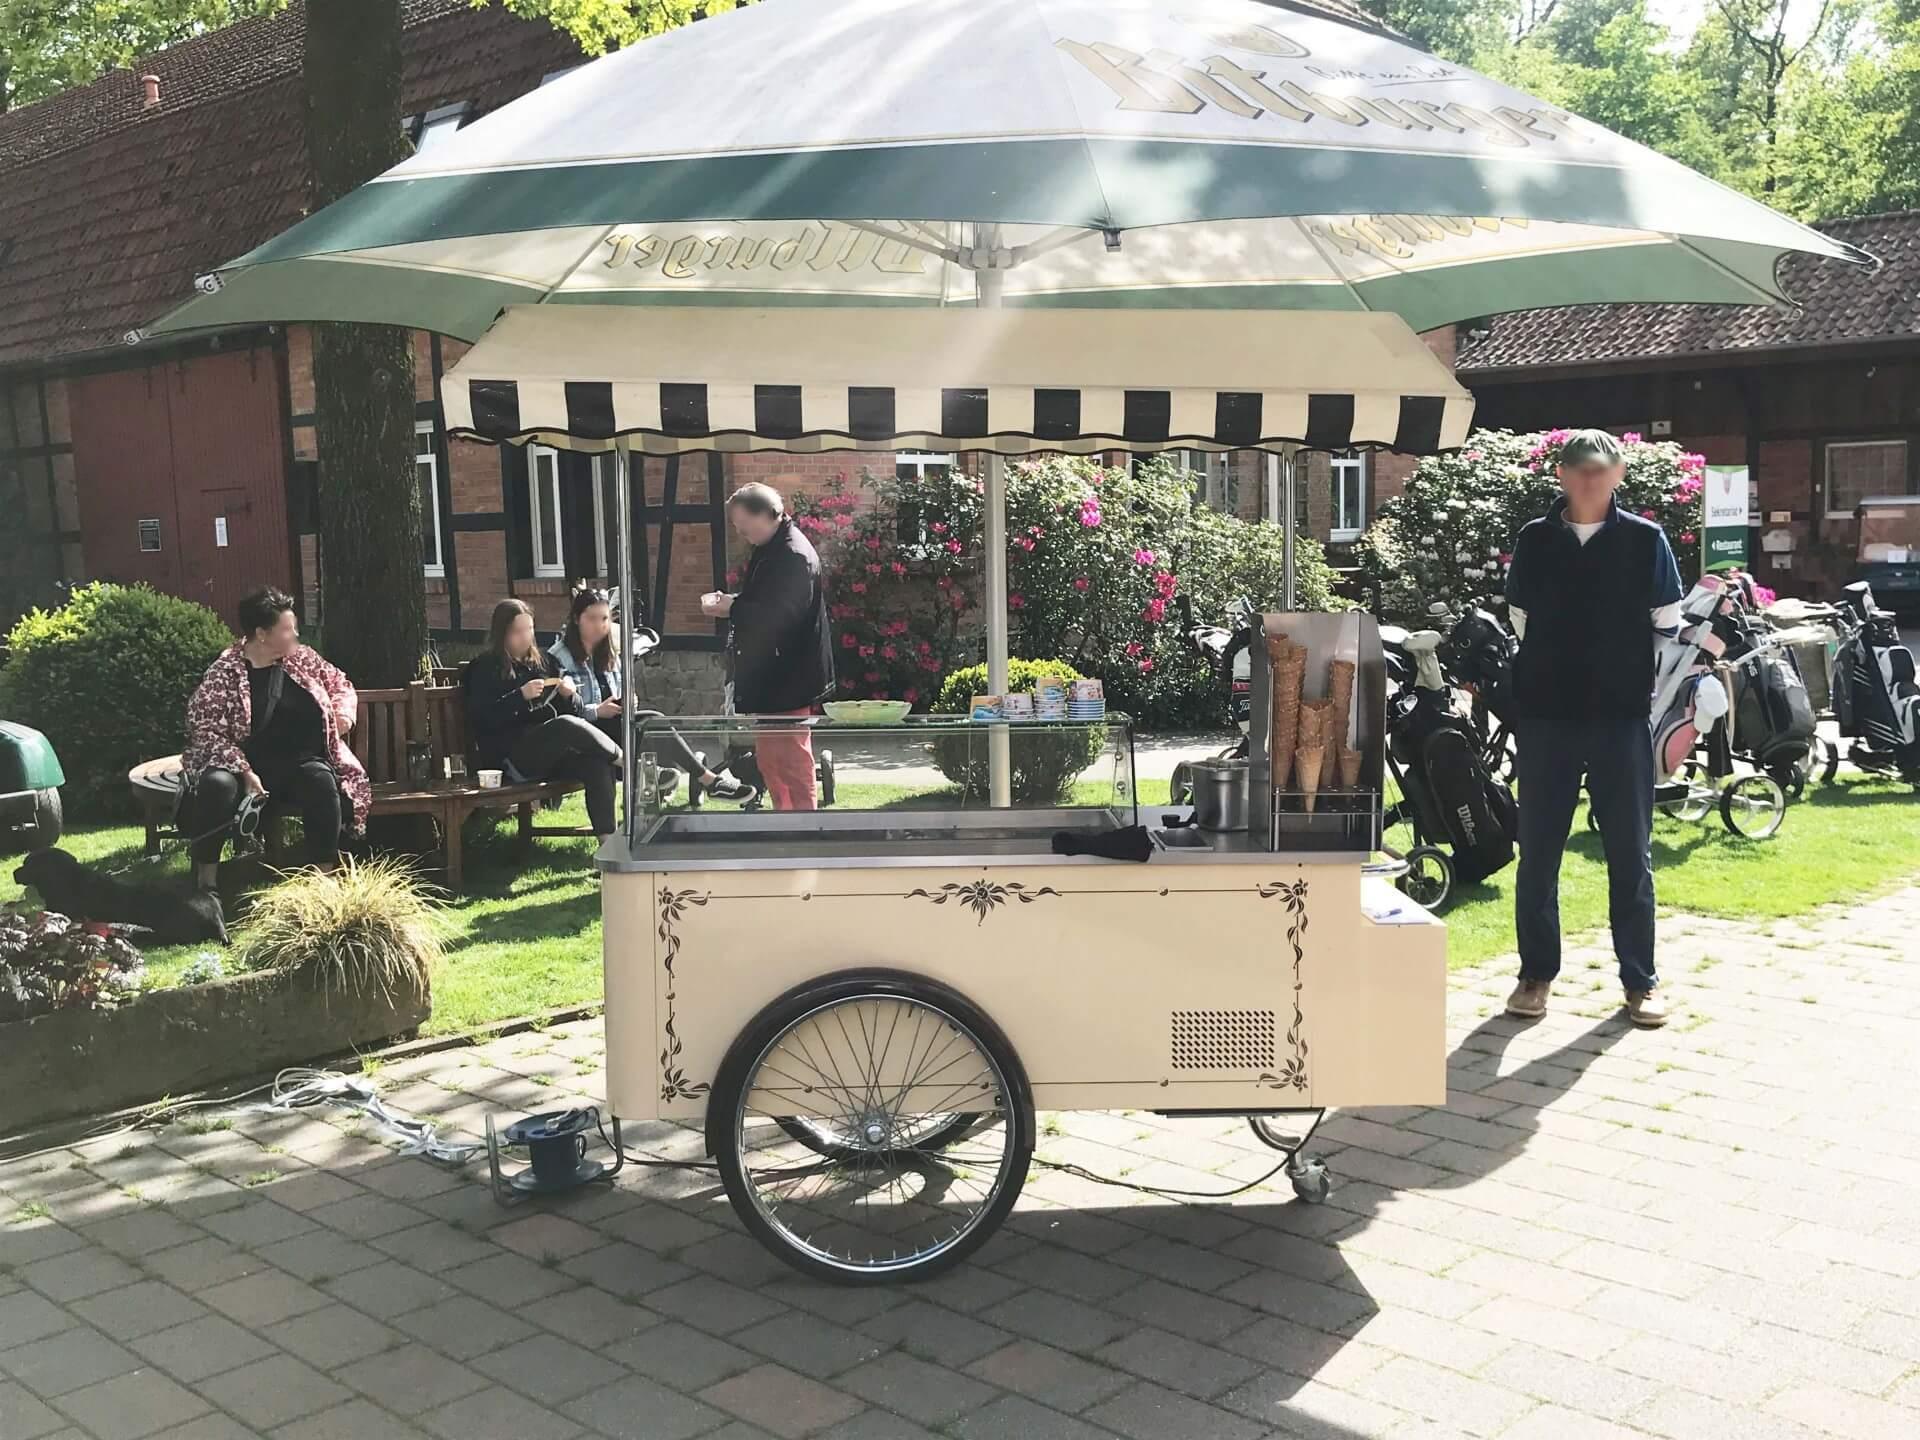 https://golfclub-peckeloh.de/wp-content/uploads/2019/05/Eiswagen.jpg